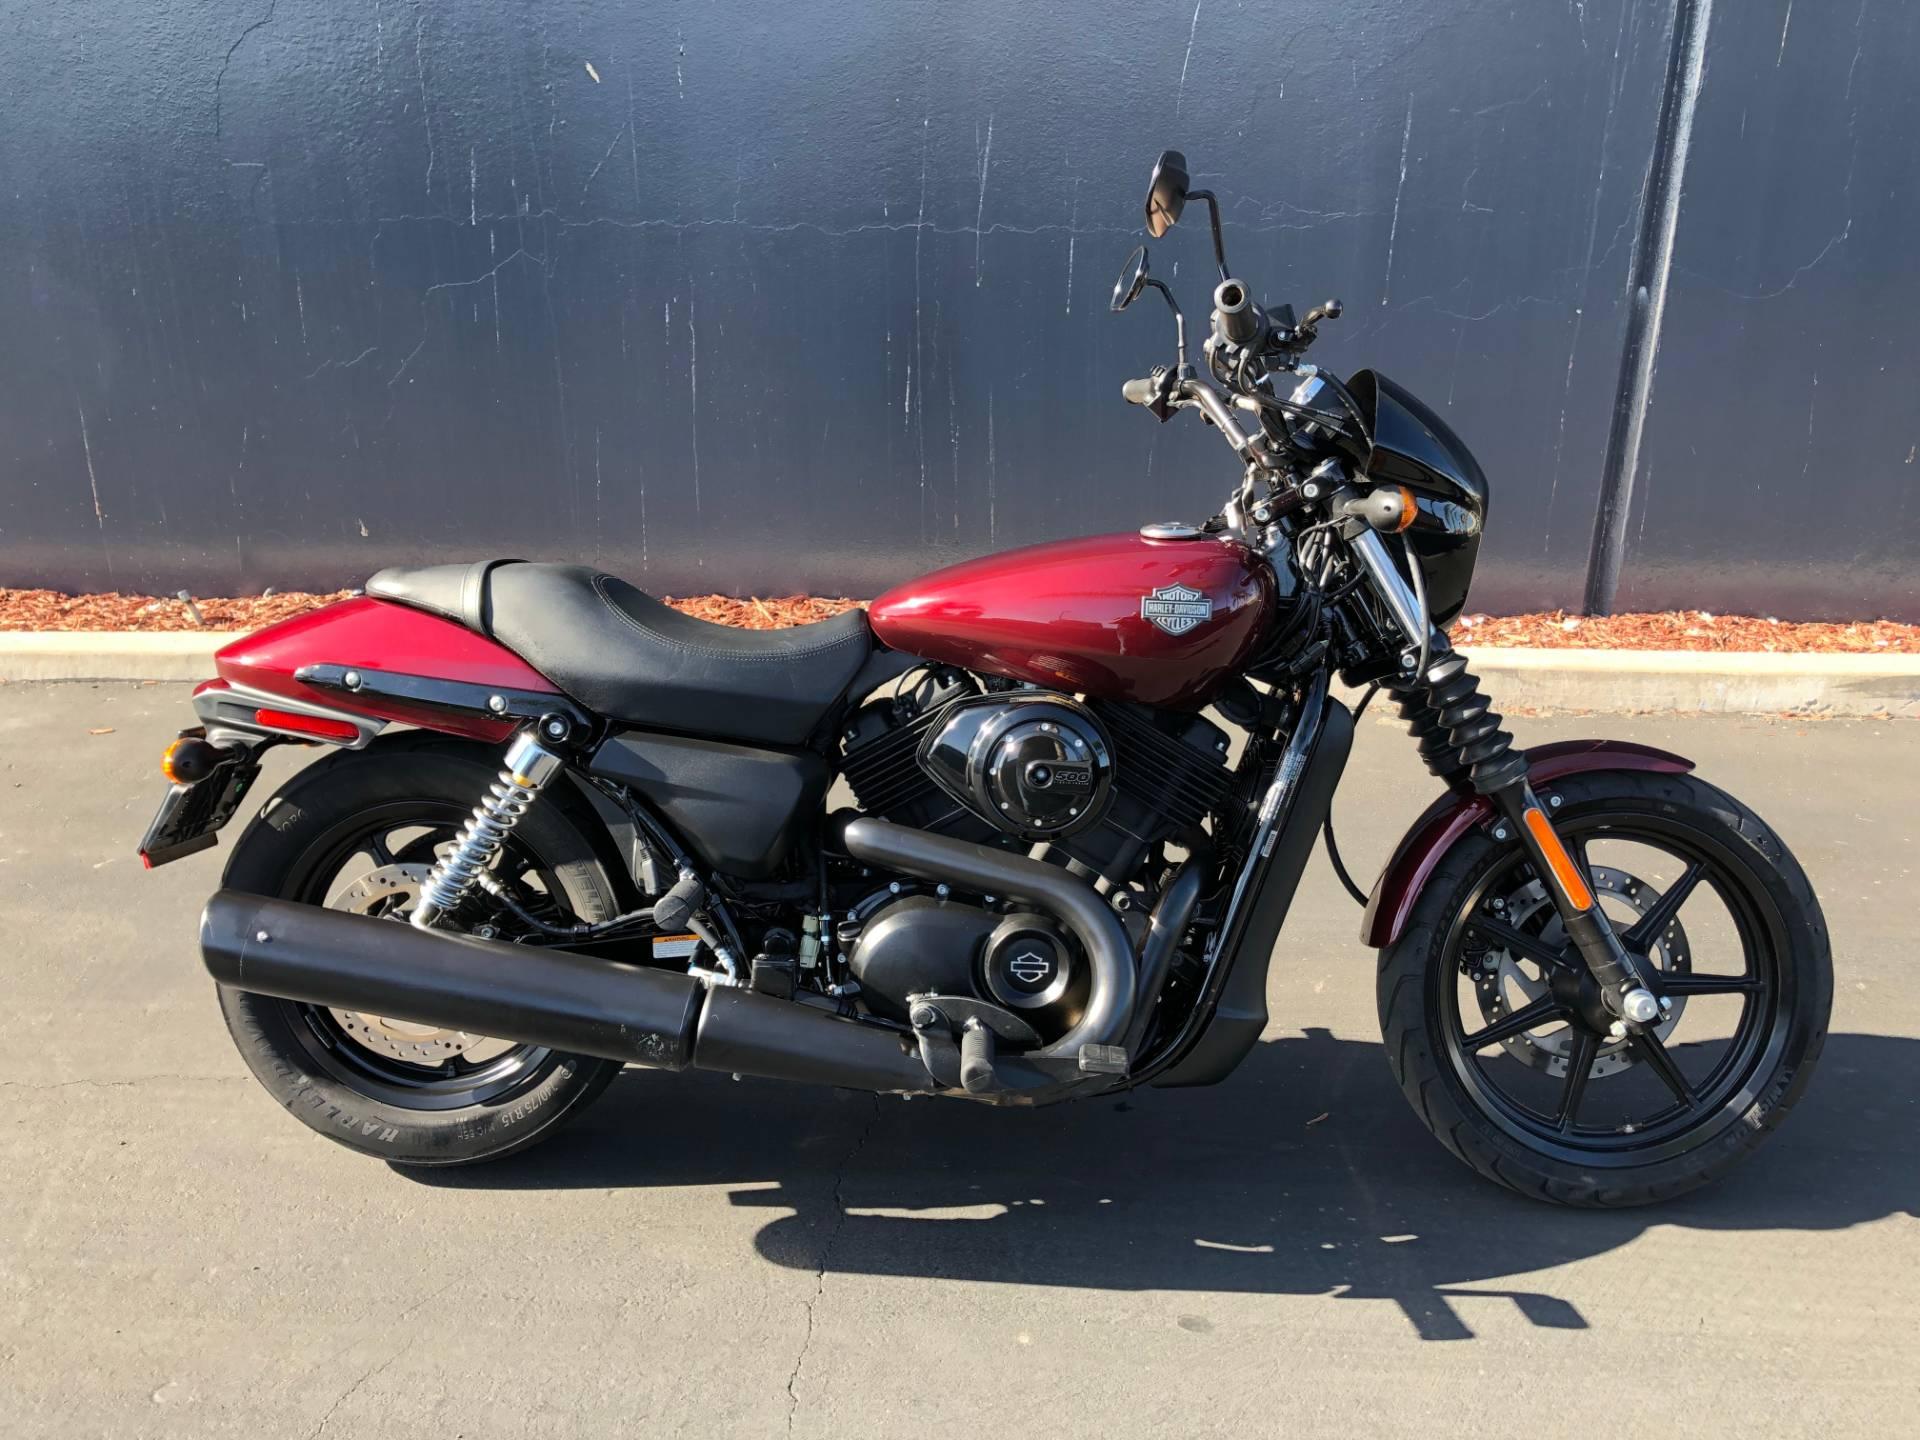 Harley Street 500 >> Used 2015 Harley Davidson Street 500 Motorcycles In Chula Vista